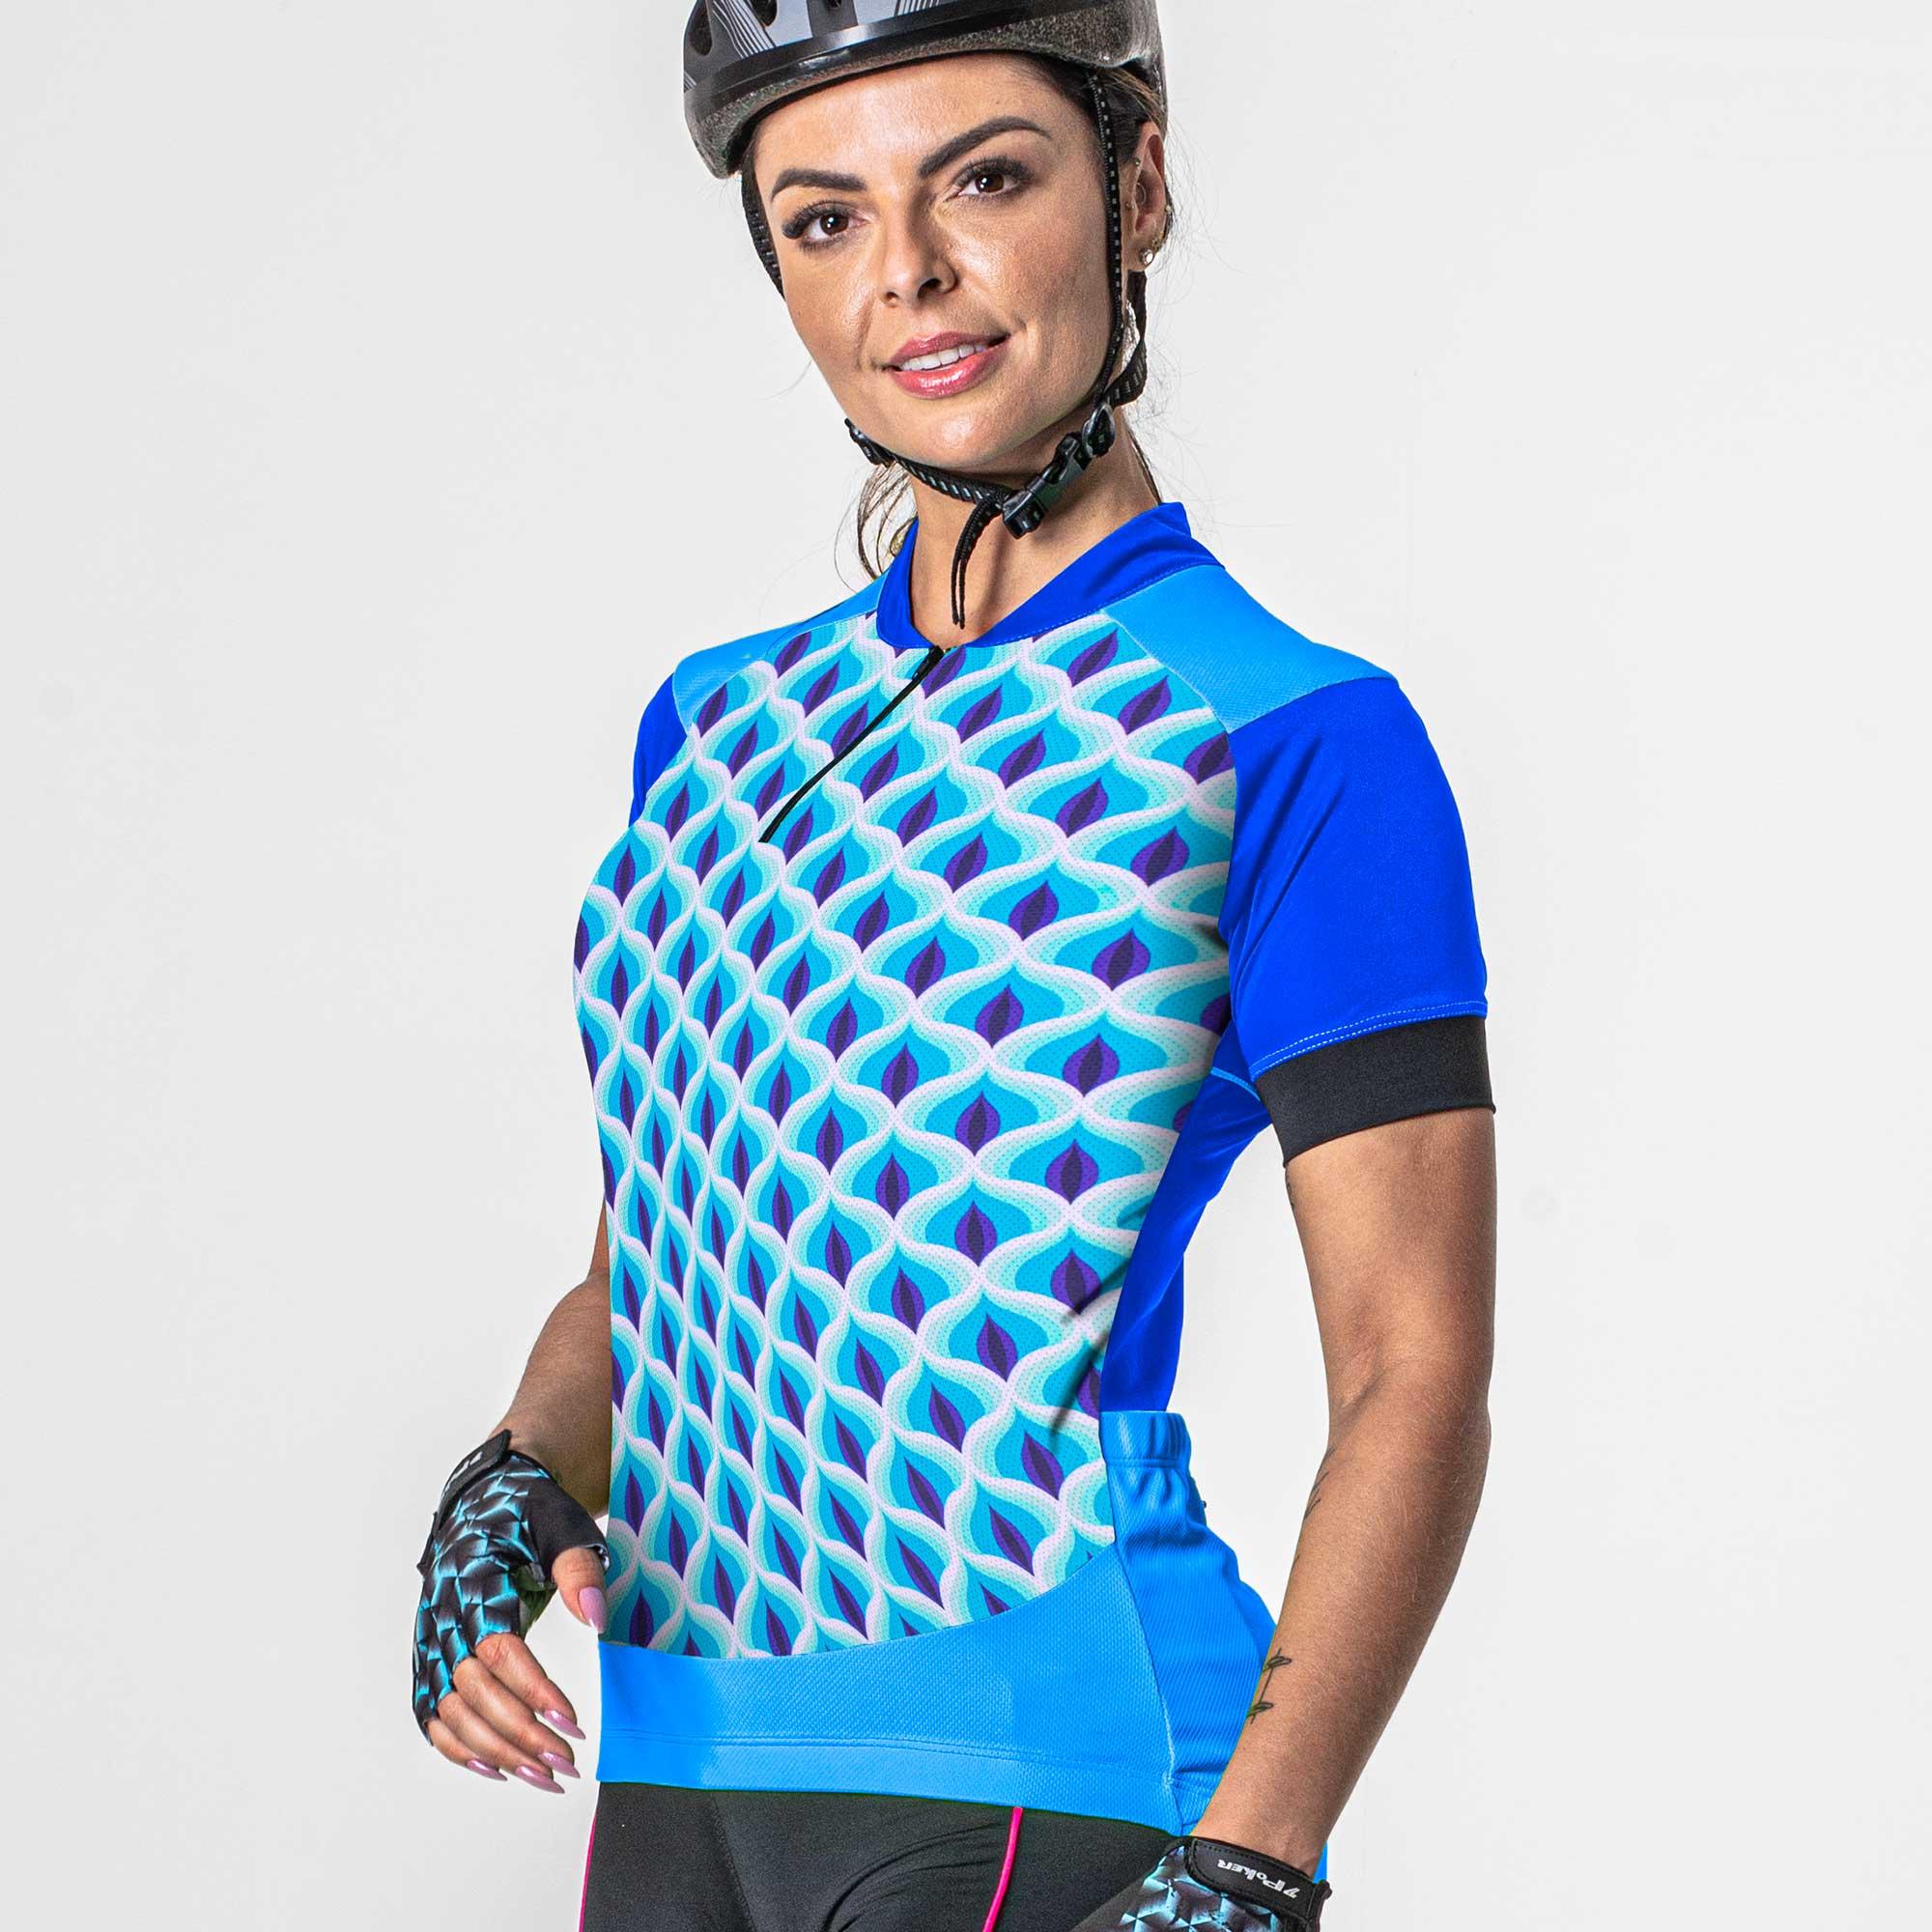 Camisa Ciclista Manga Curta Zíper Parcial Feminina Nyx 04236